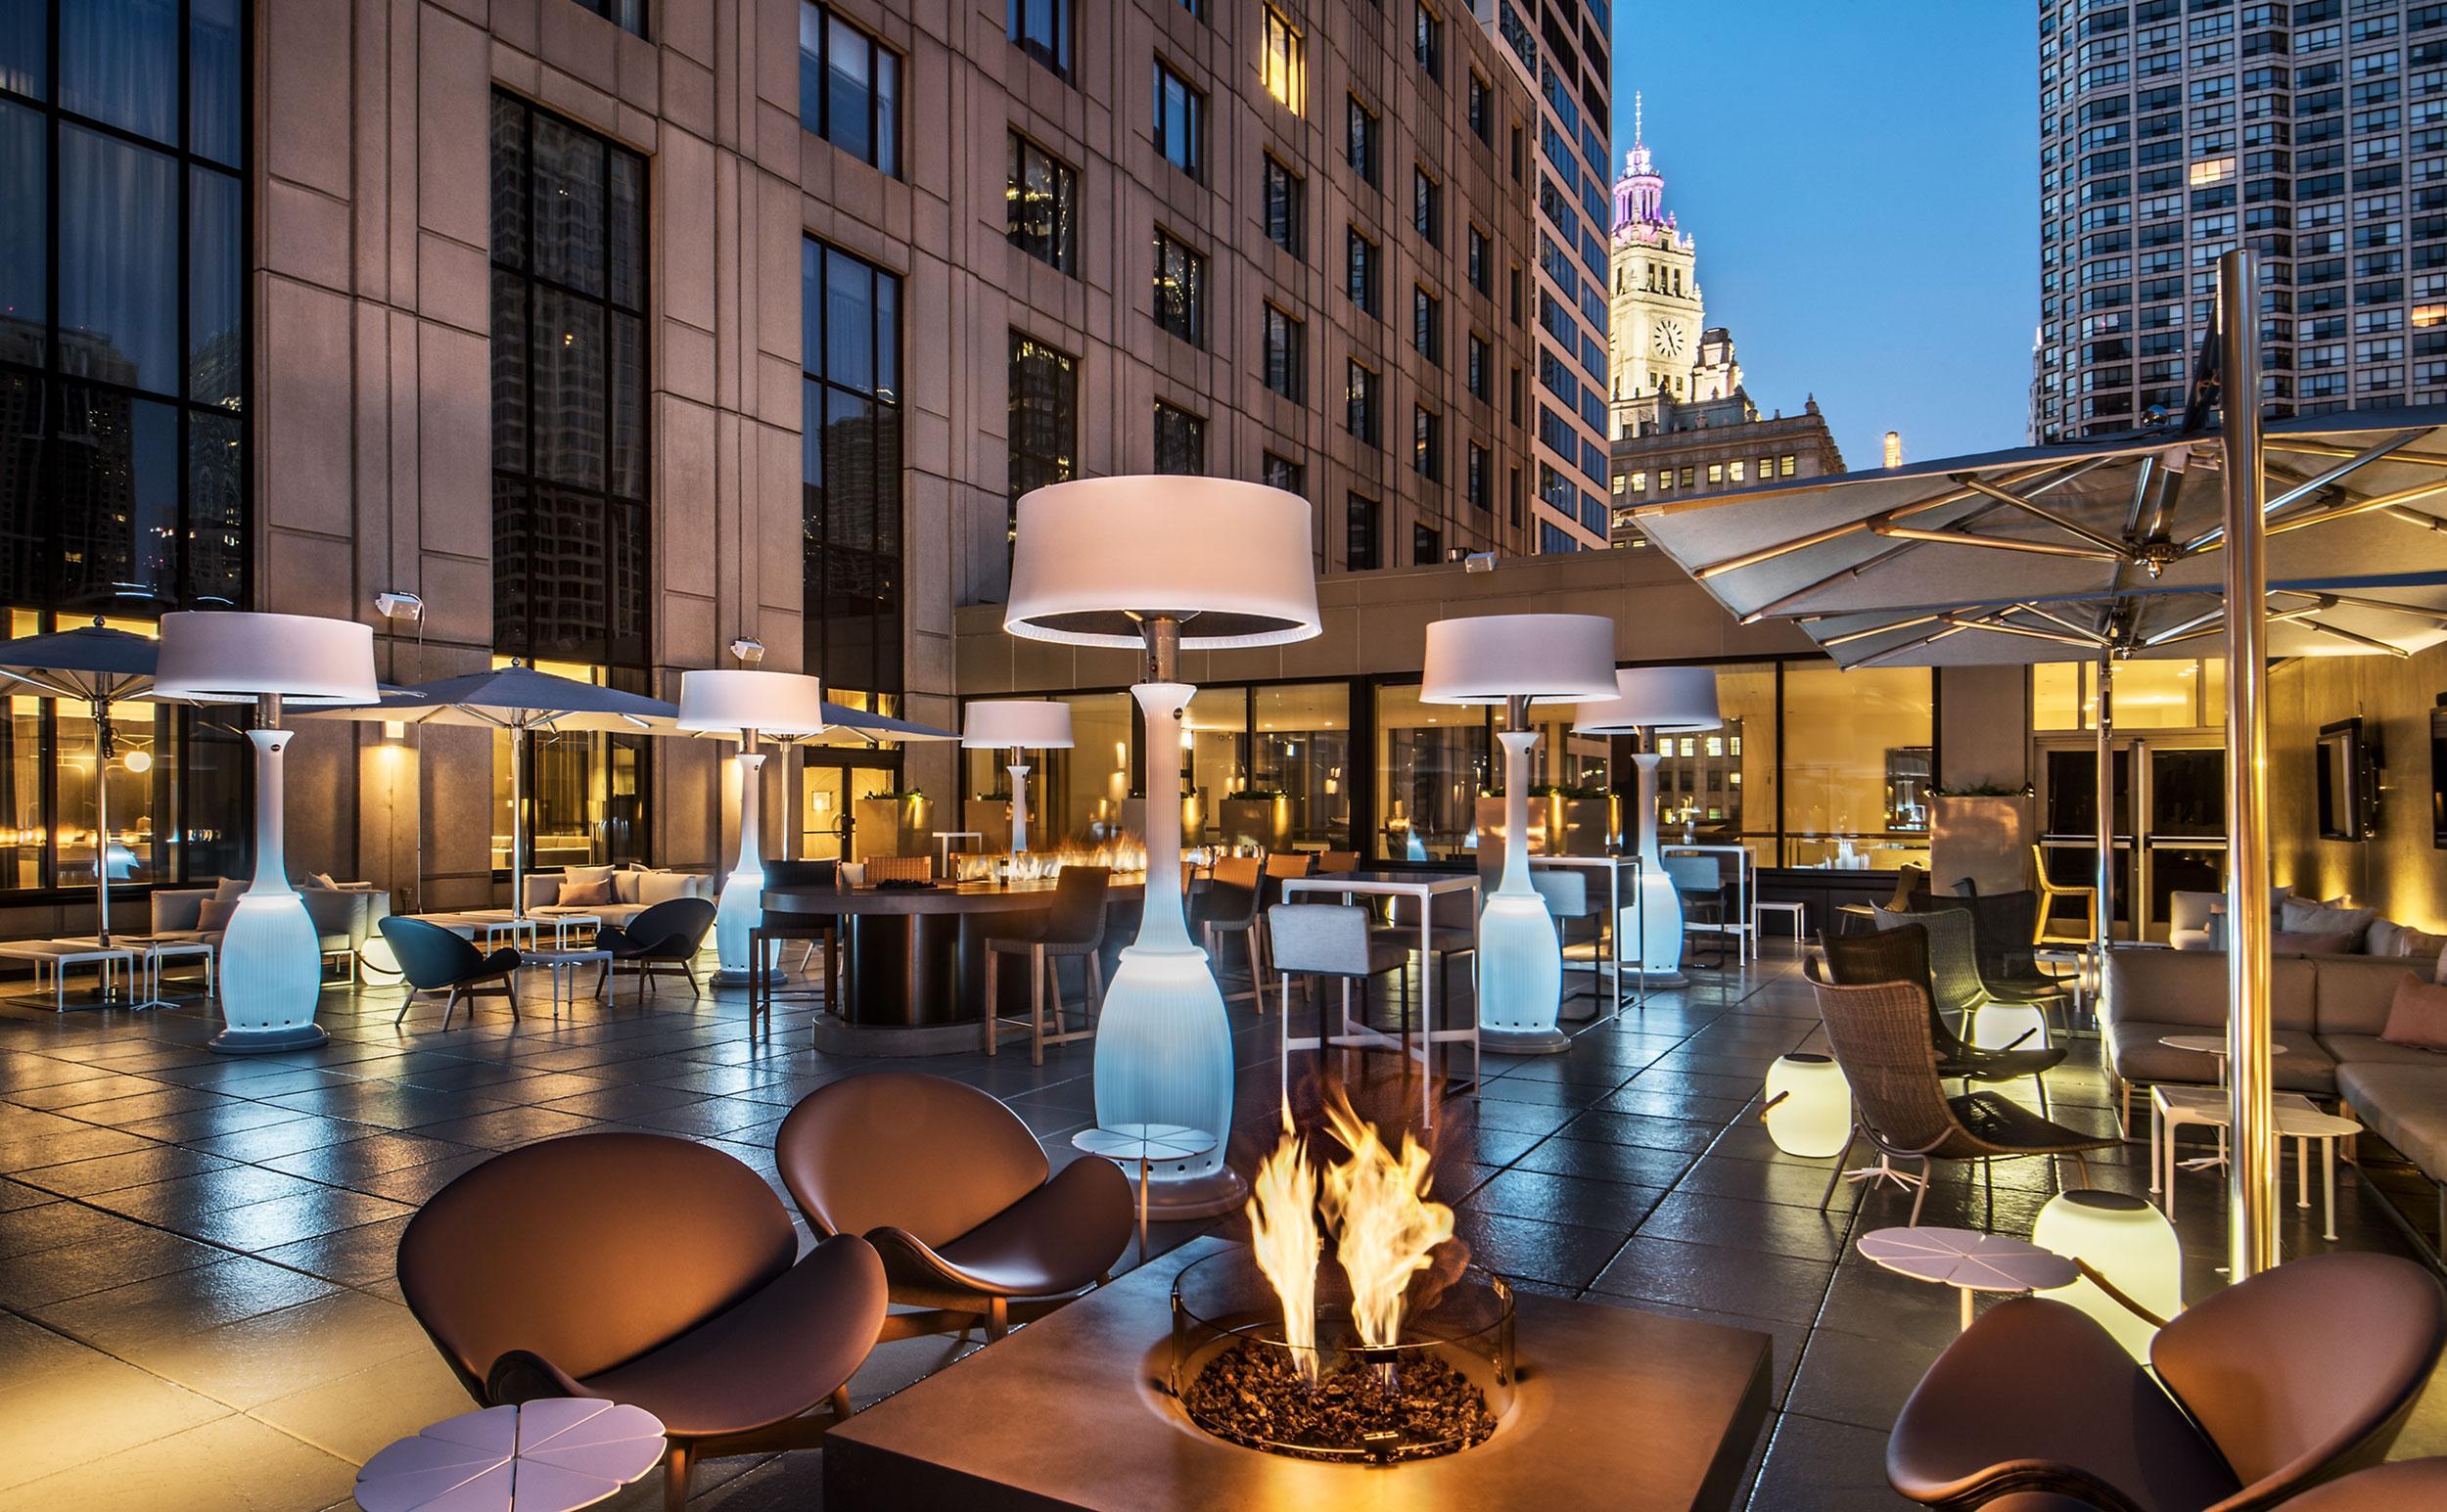 Hilton Garden Inn New York Times Square South Hotel, New Fashion square hotel michigan